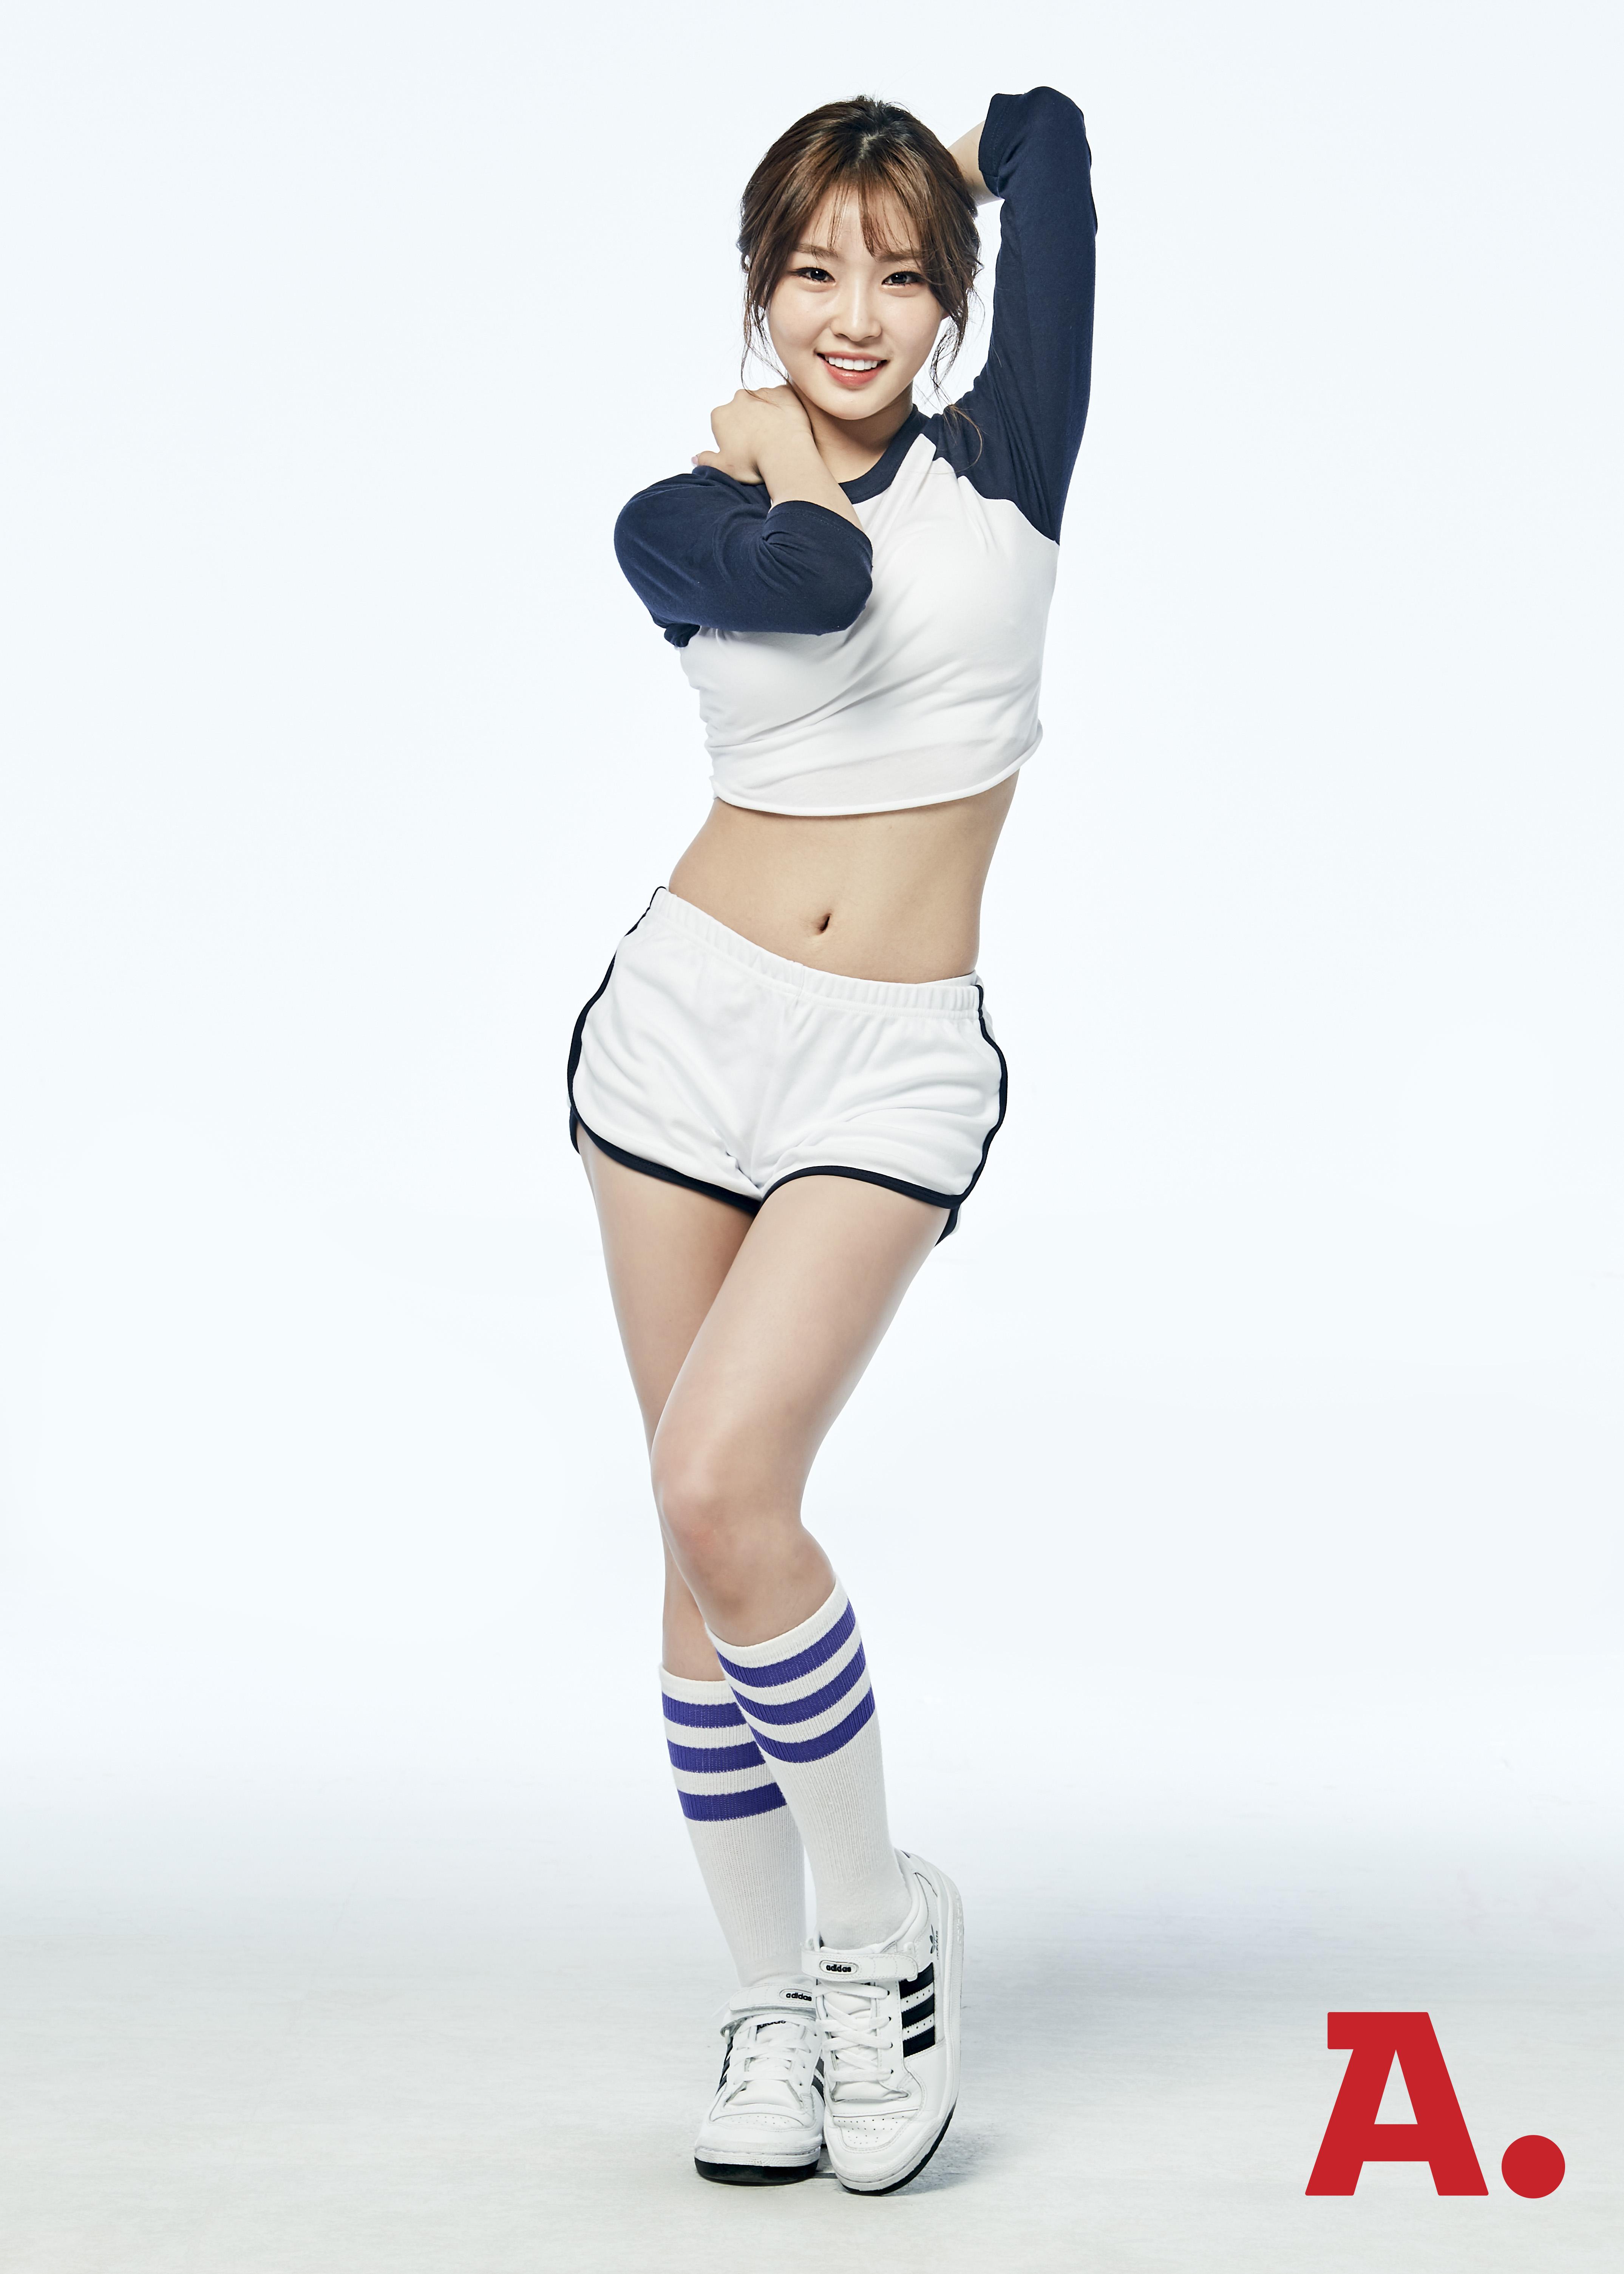 Kim Chung Ha Androidiphone Wallpaper 50342 Asiachan Kpop Image Board